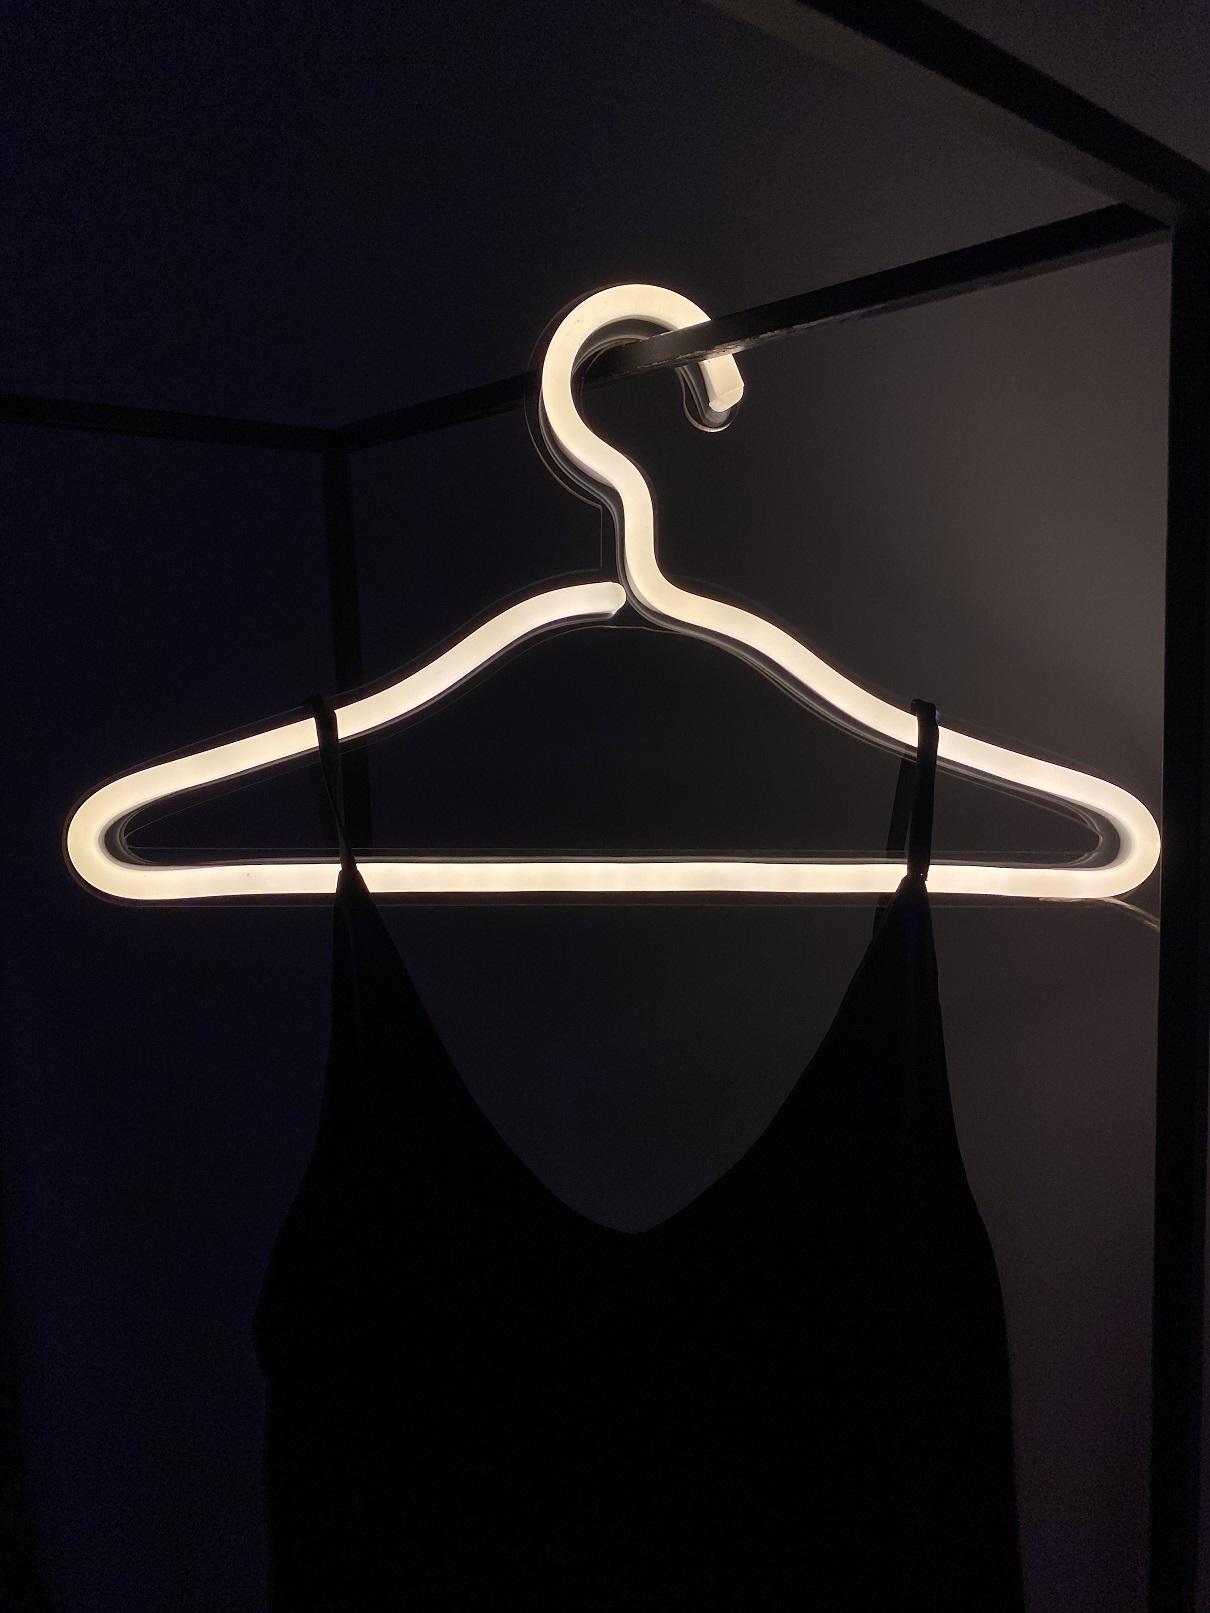 dress hanger neon sign